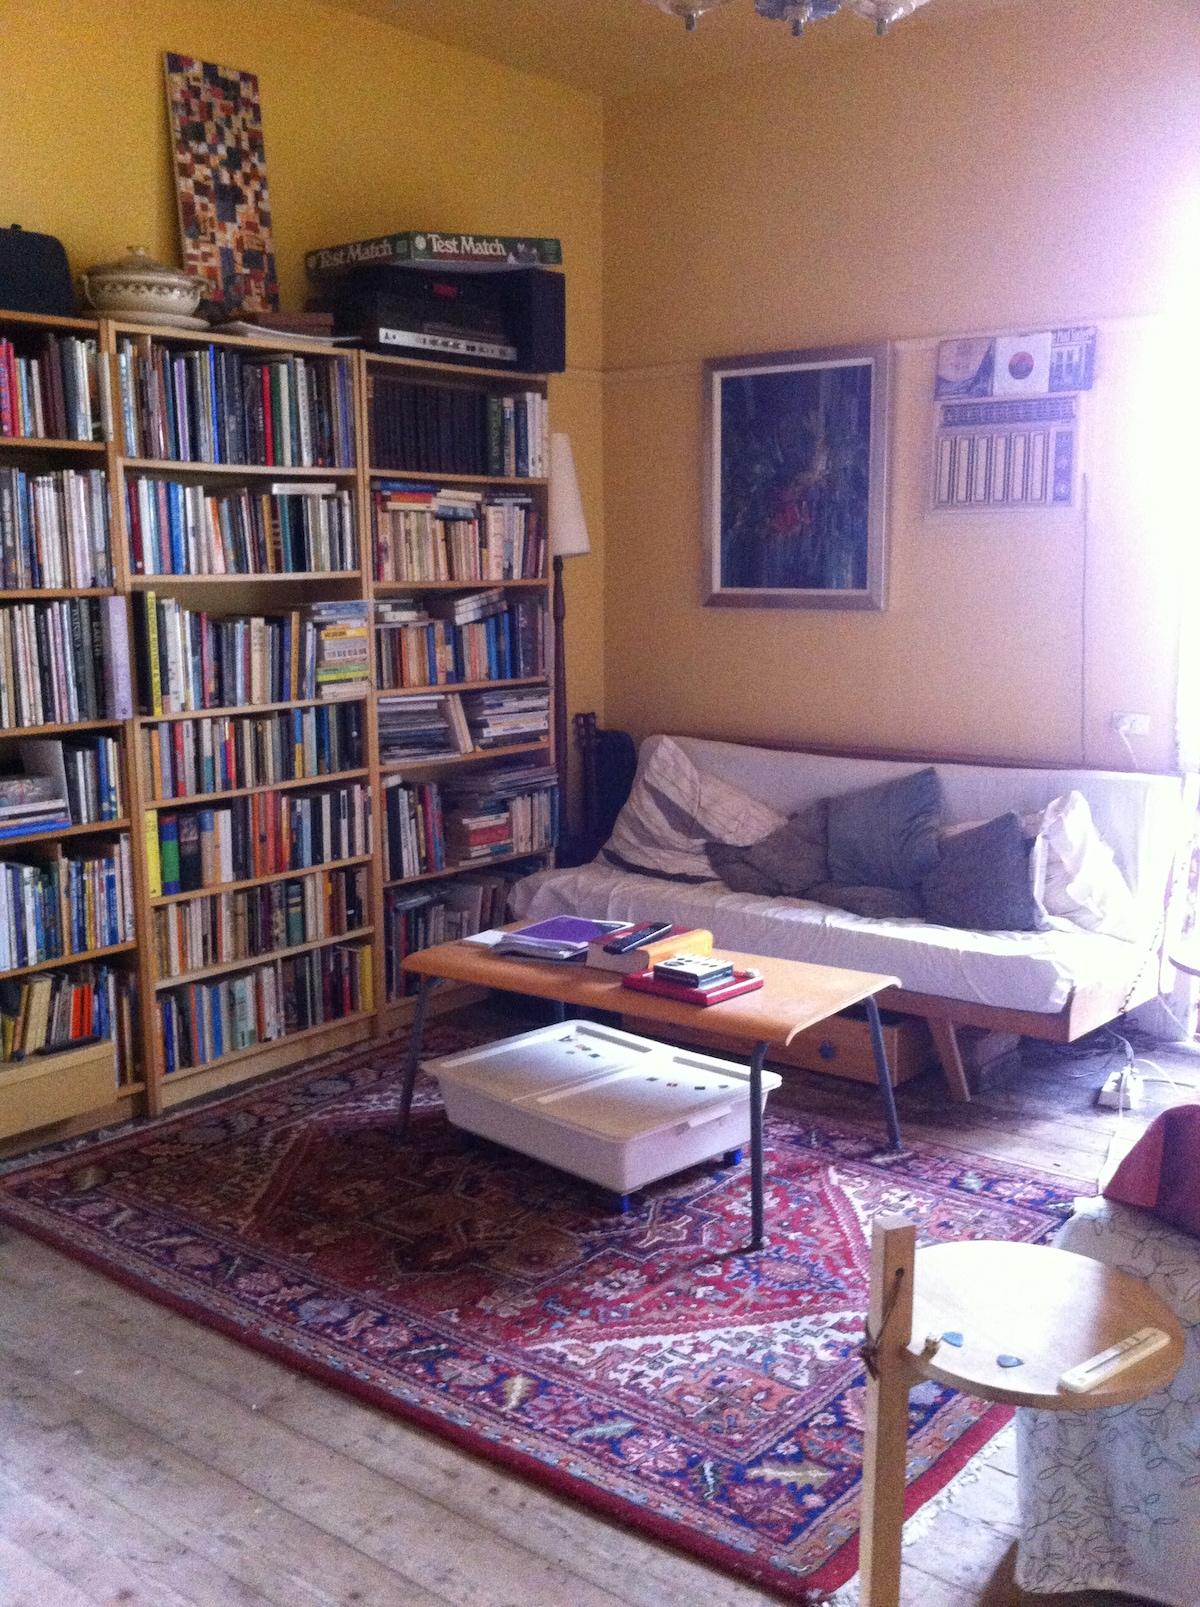 Living room - we like books!!